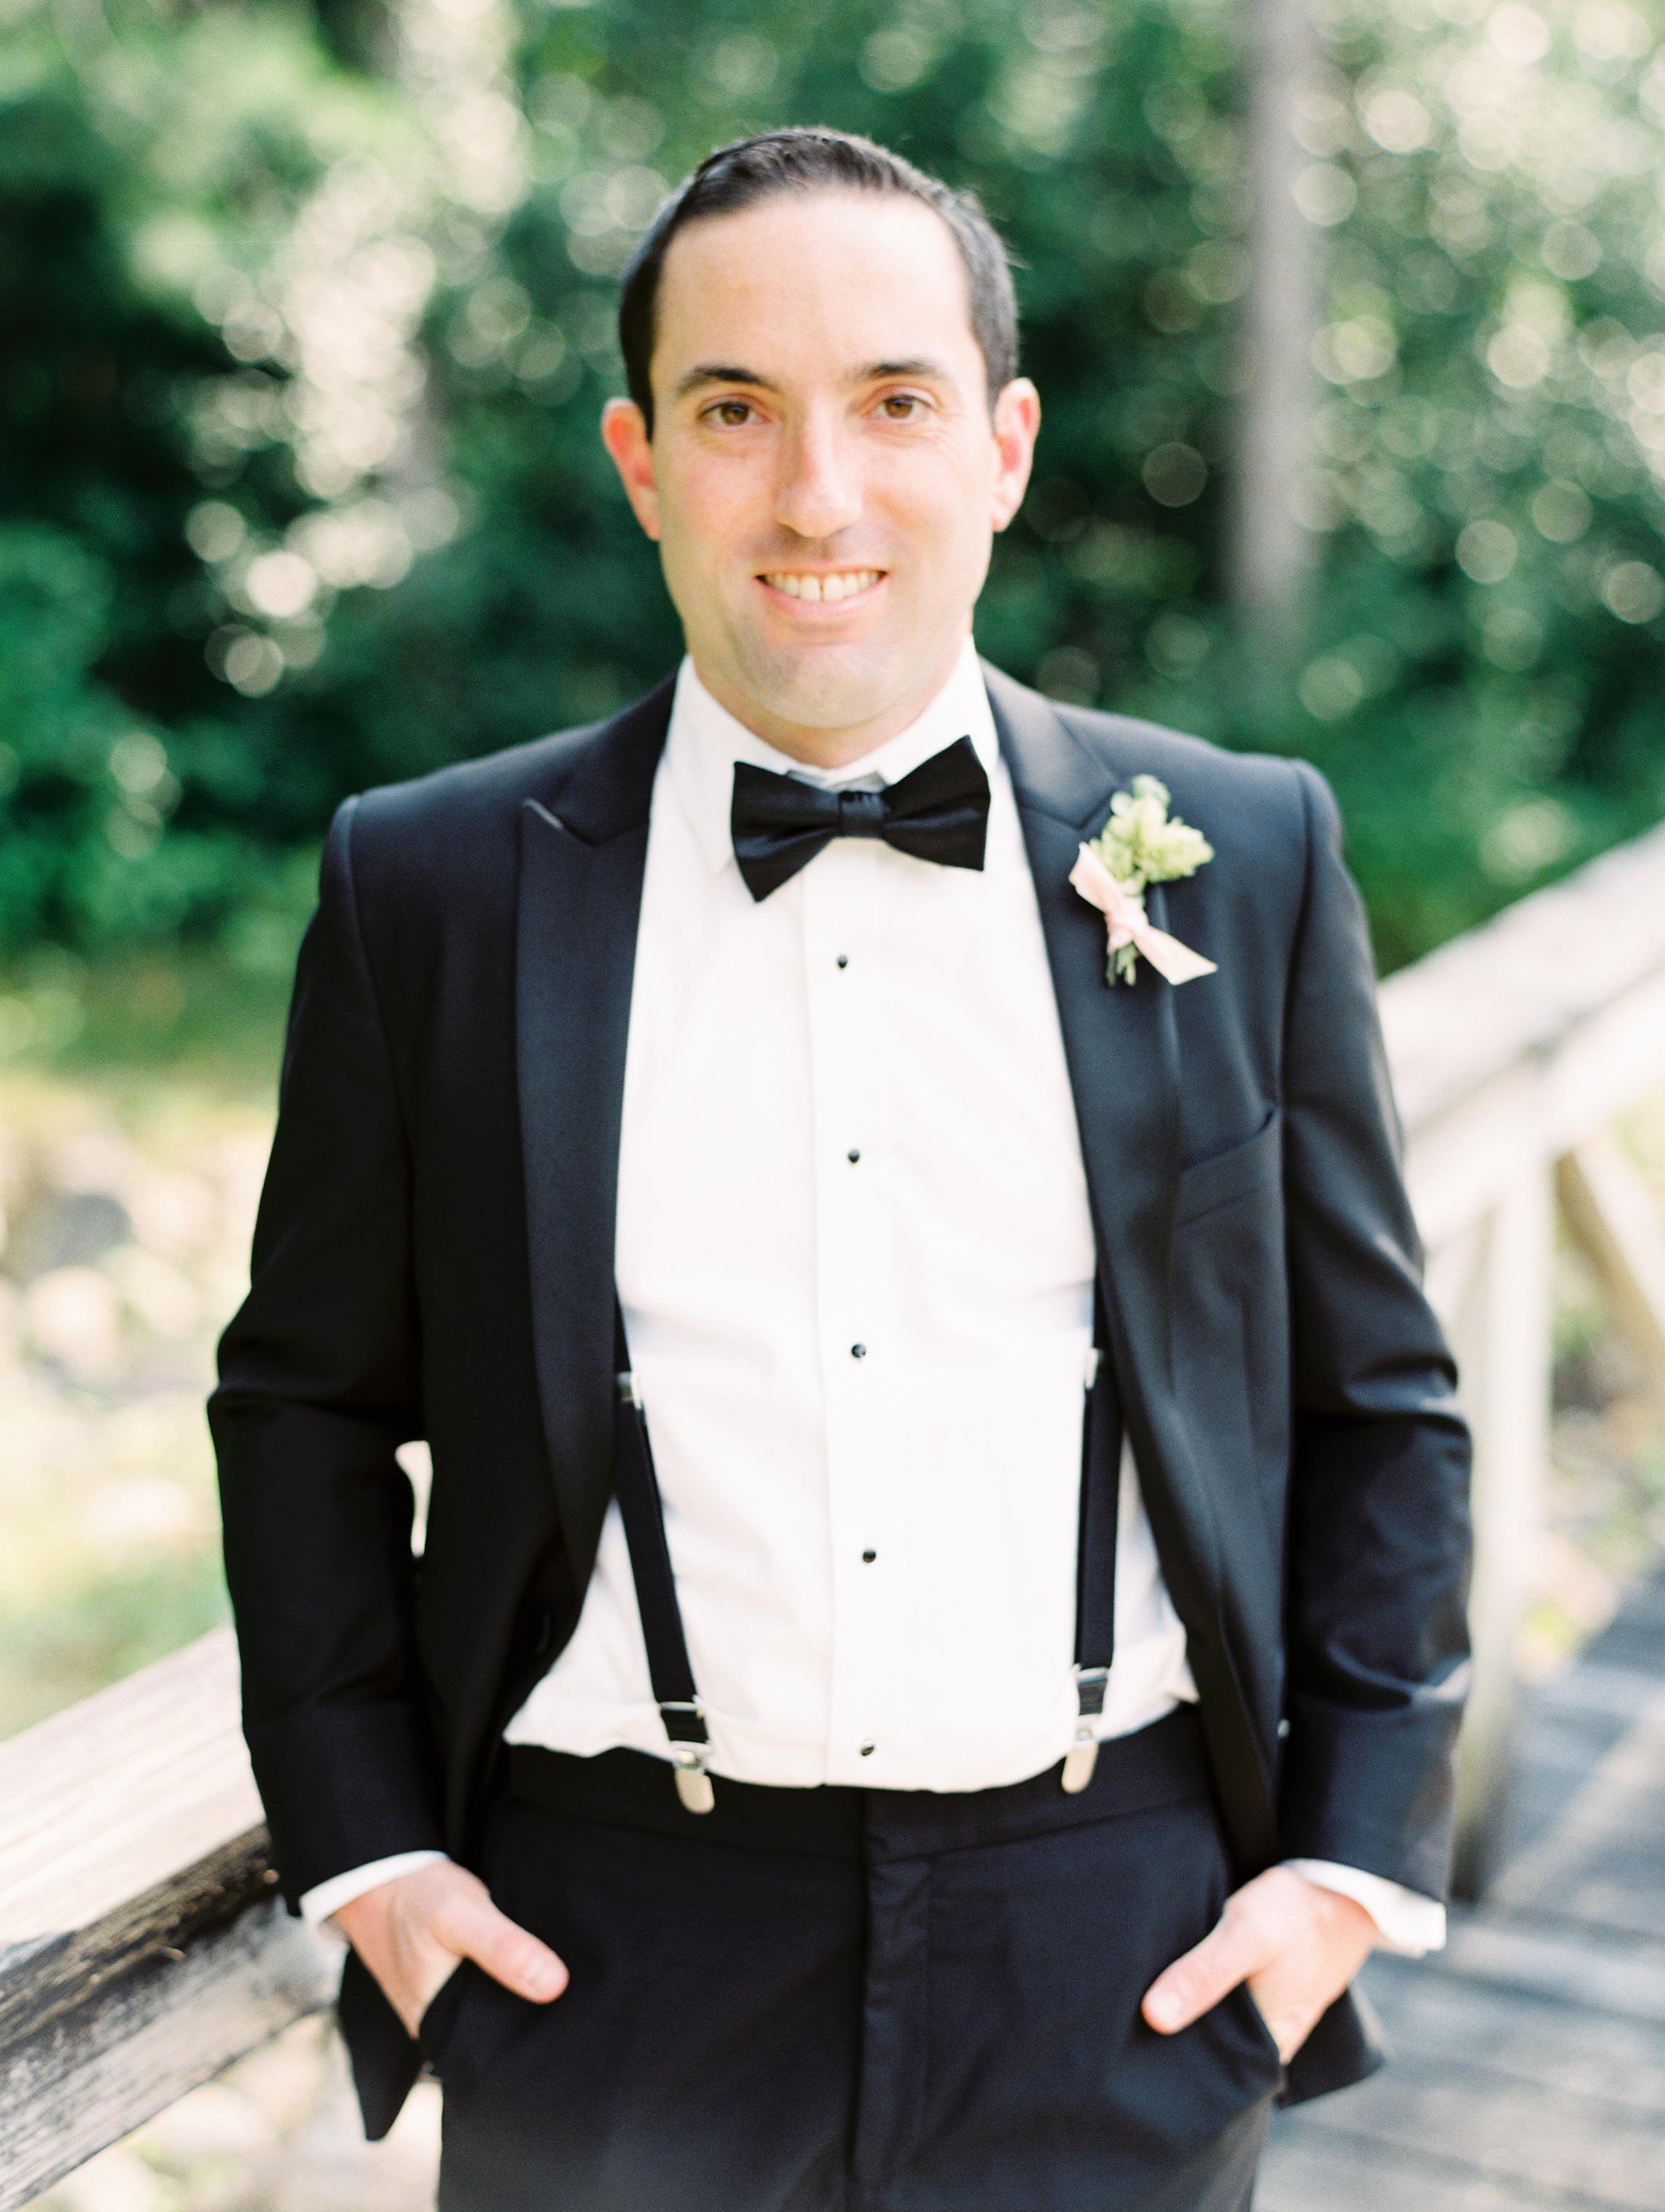 Zoller+Wedding+Bridal+Partyf-41.jpg